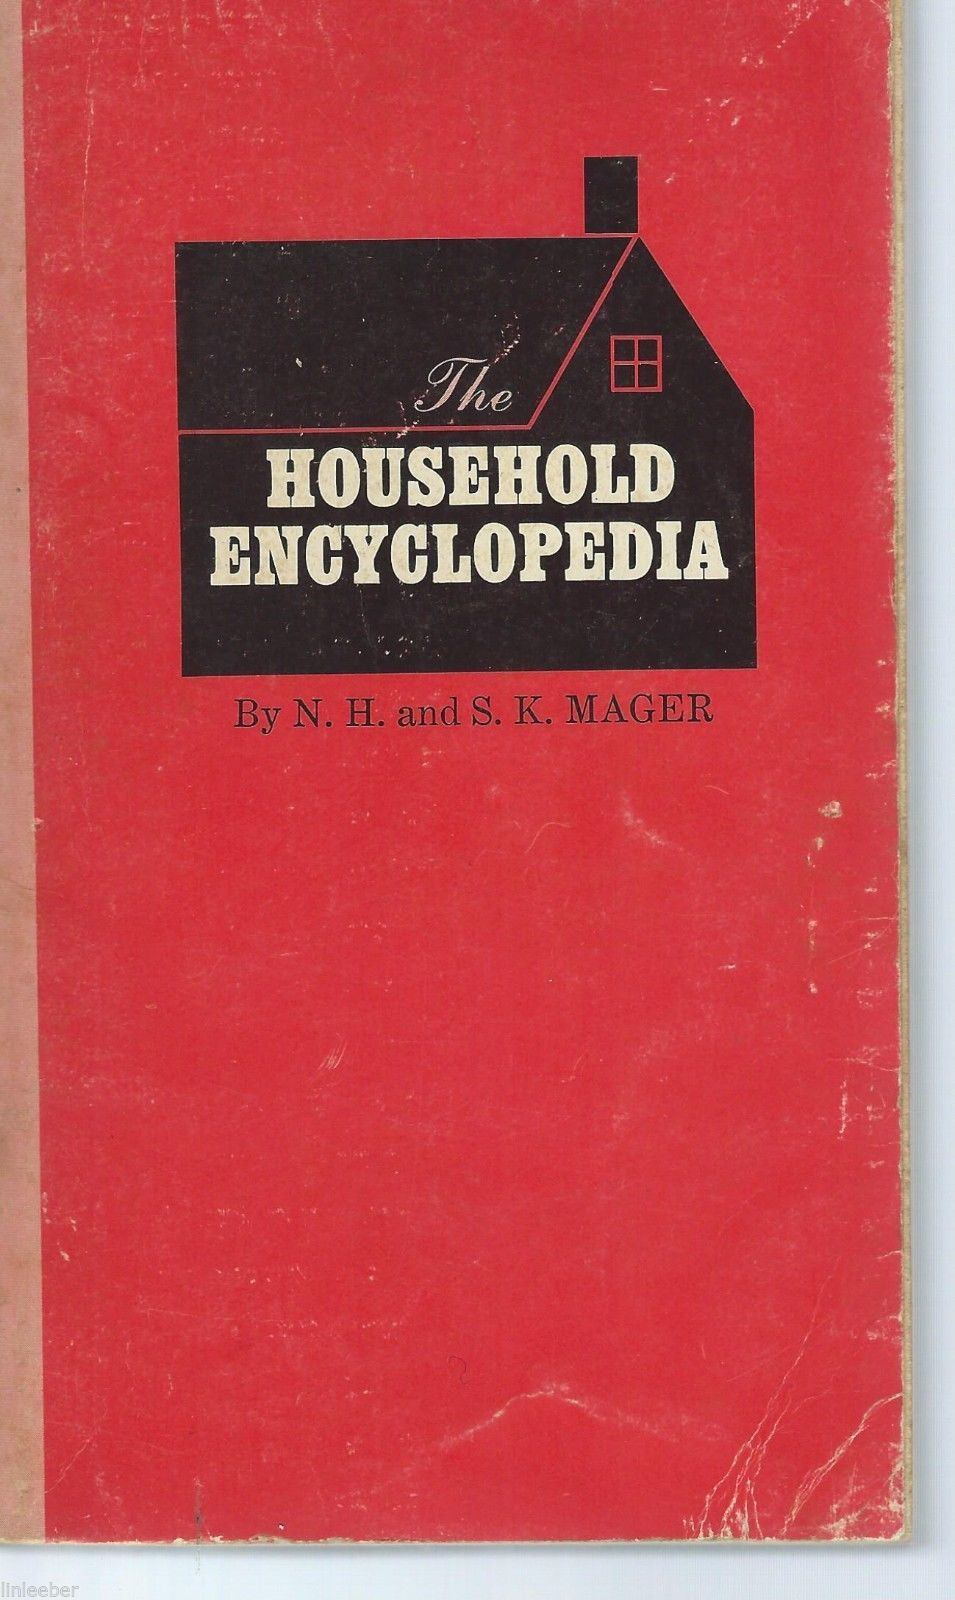 THE HOUSEHOLD ENCYCLOPEDIA-Home Repair Finance Book;1971;12th printing;Pocket B